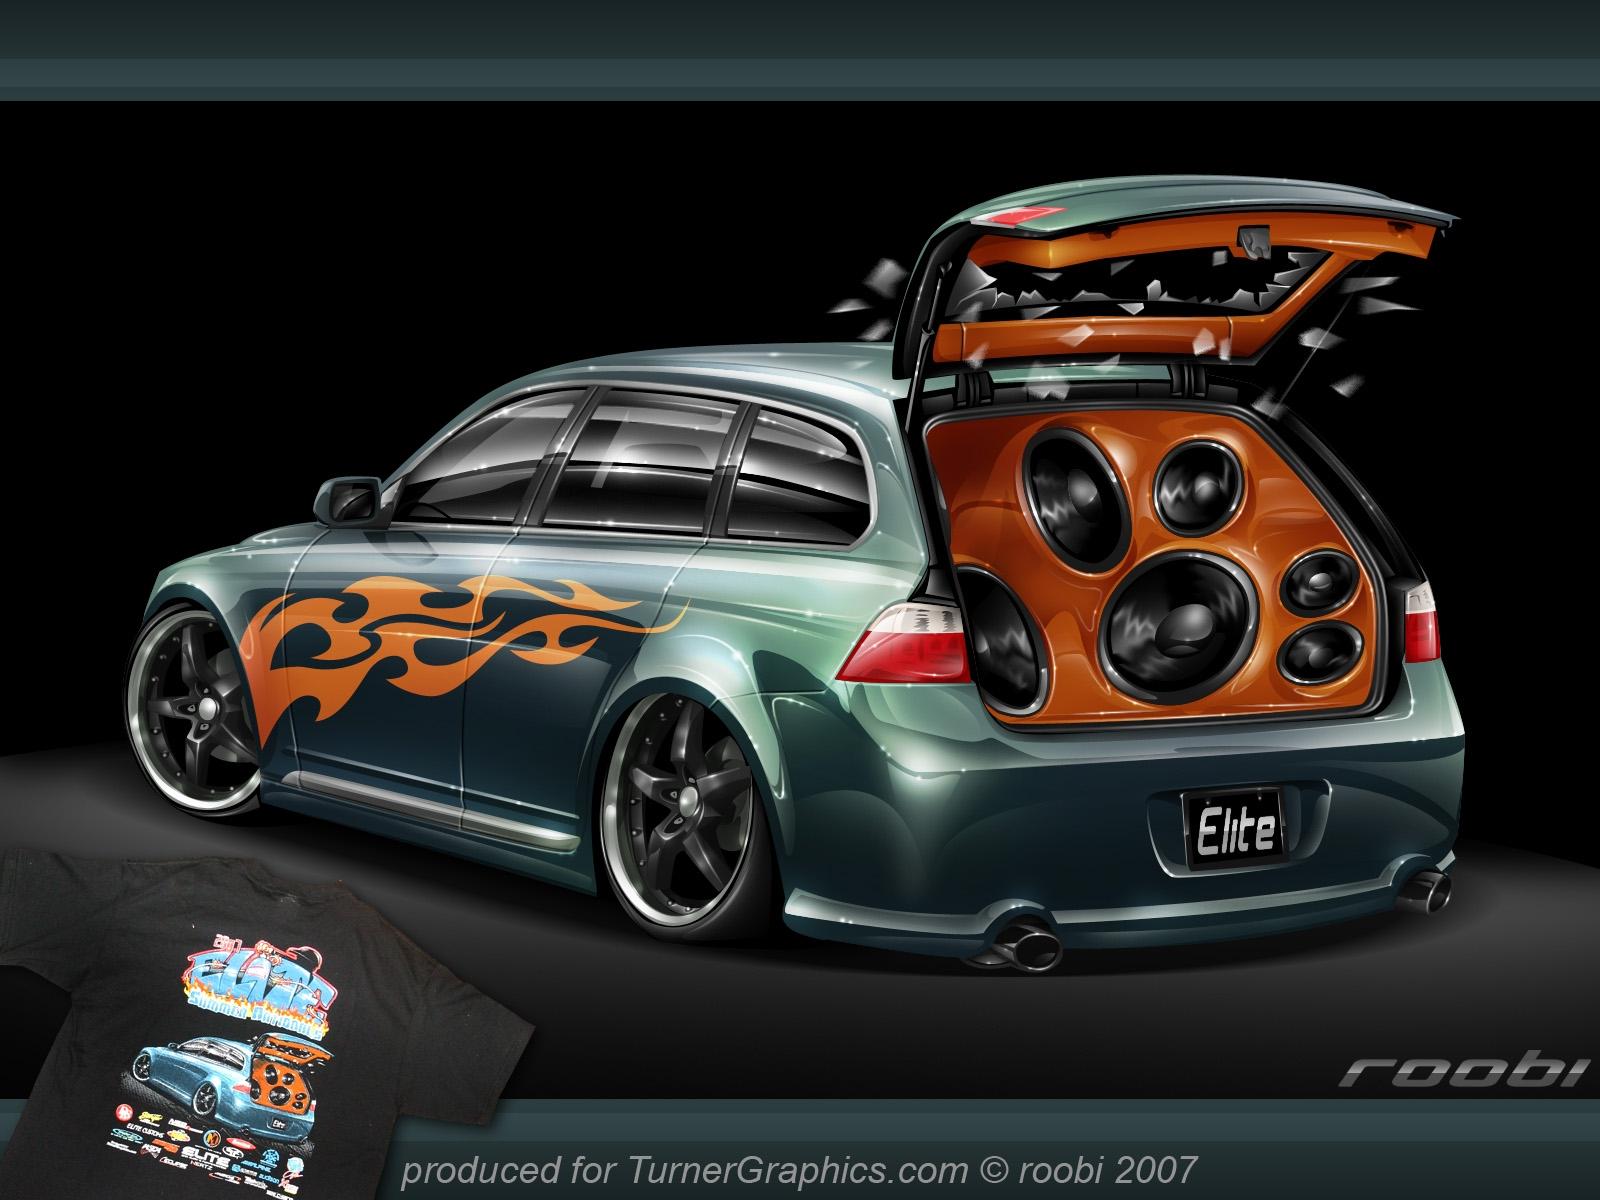 Hd Wallpapers Cars Mustang Auto Blog Carros Tunados Mega Fotos 2